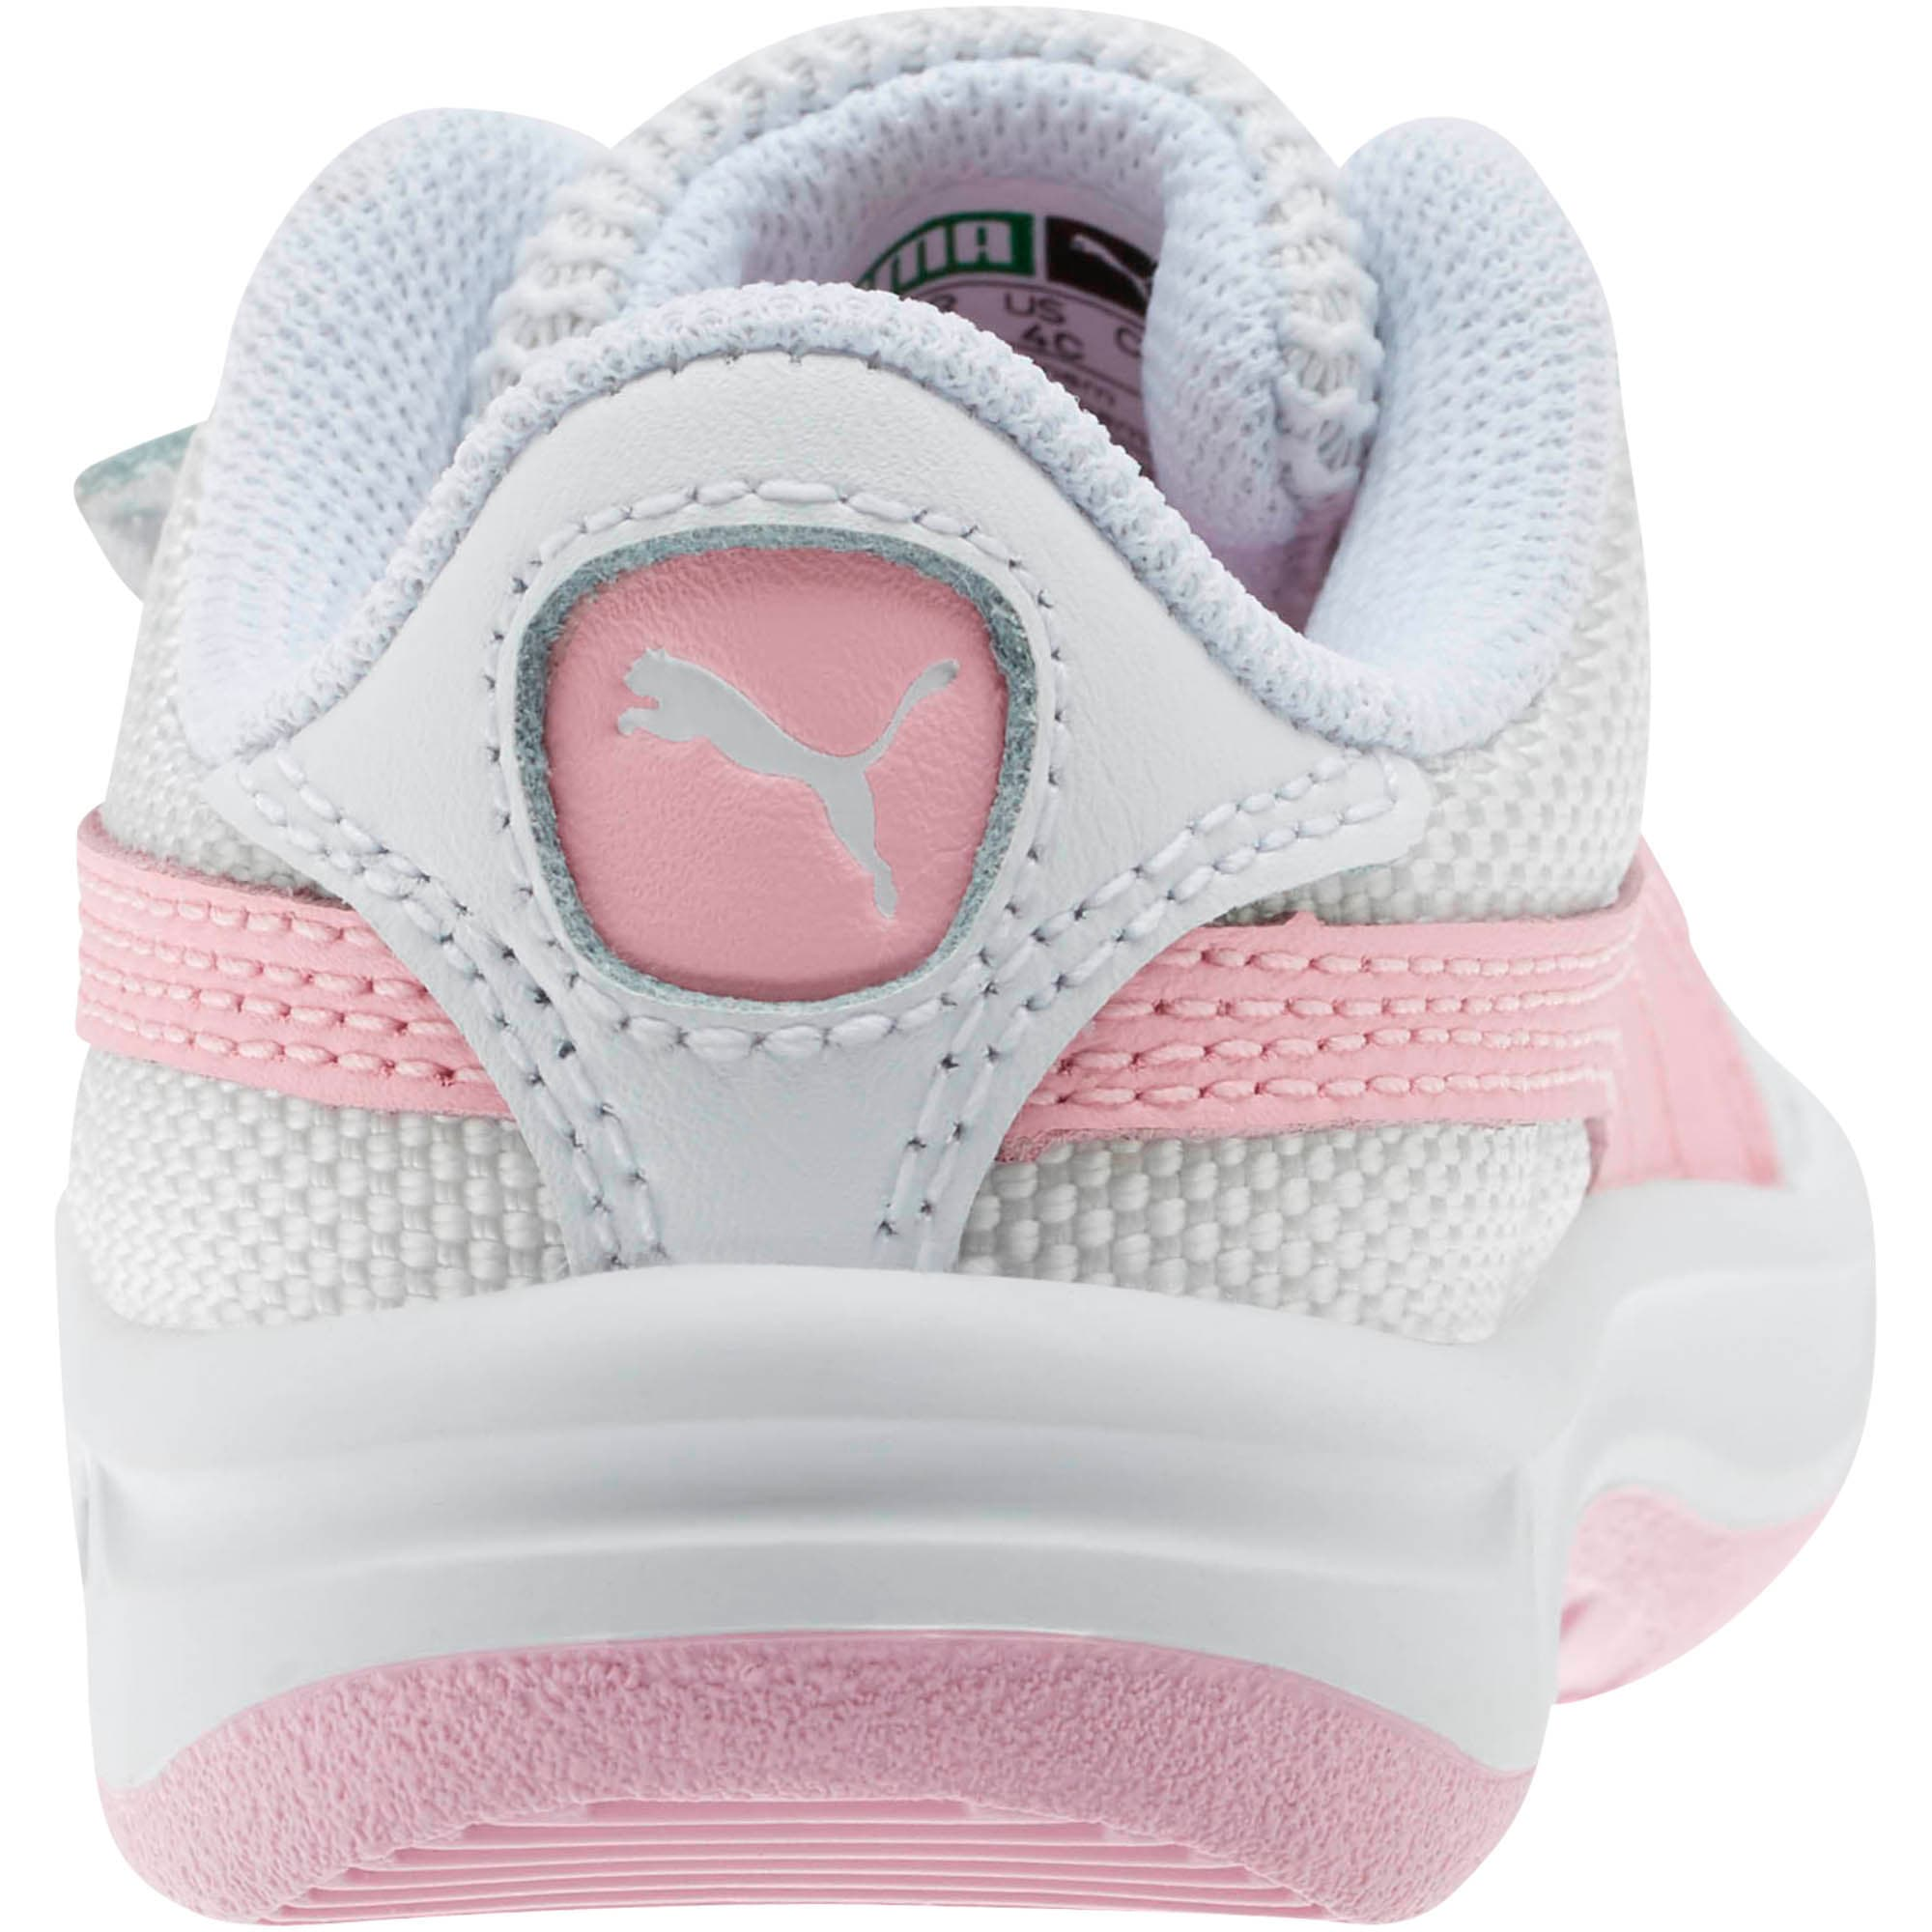 Thumbnail 3 of California Toddler Shoes, Puma Wht-Pale Pink-Puma Wht, medium